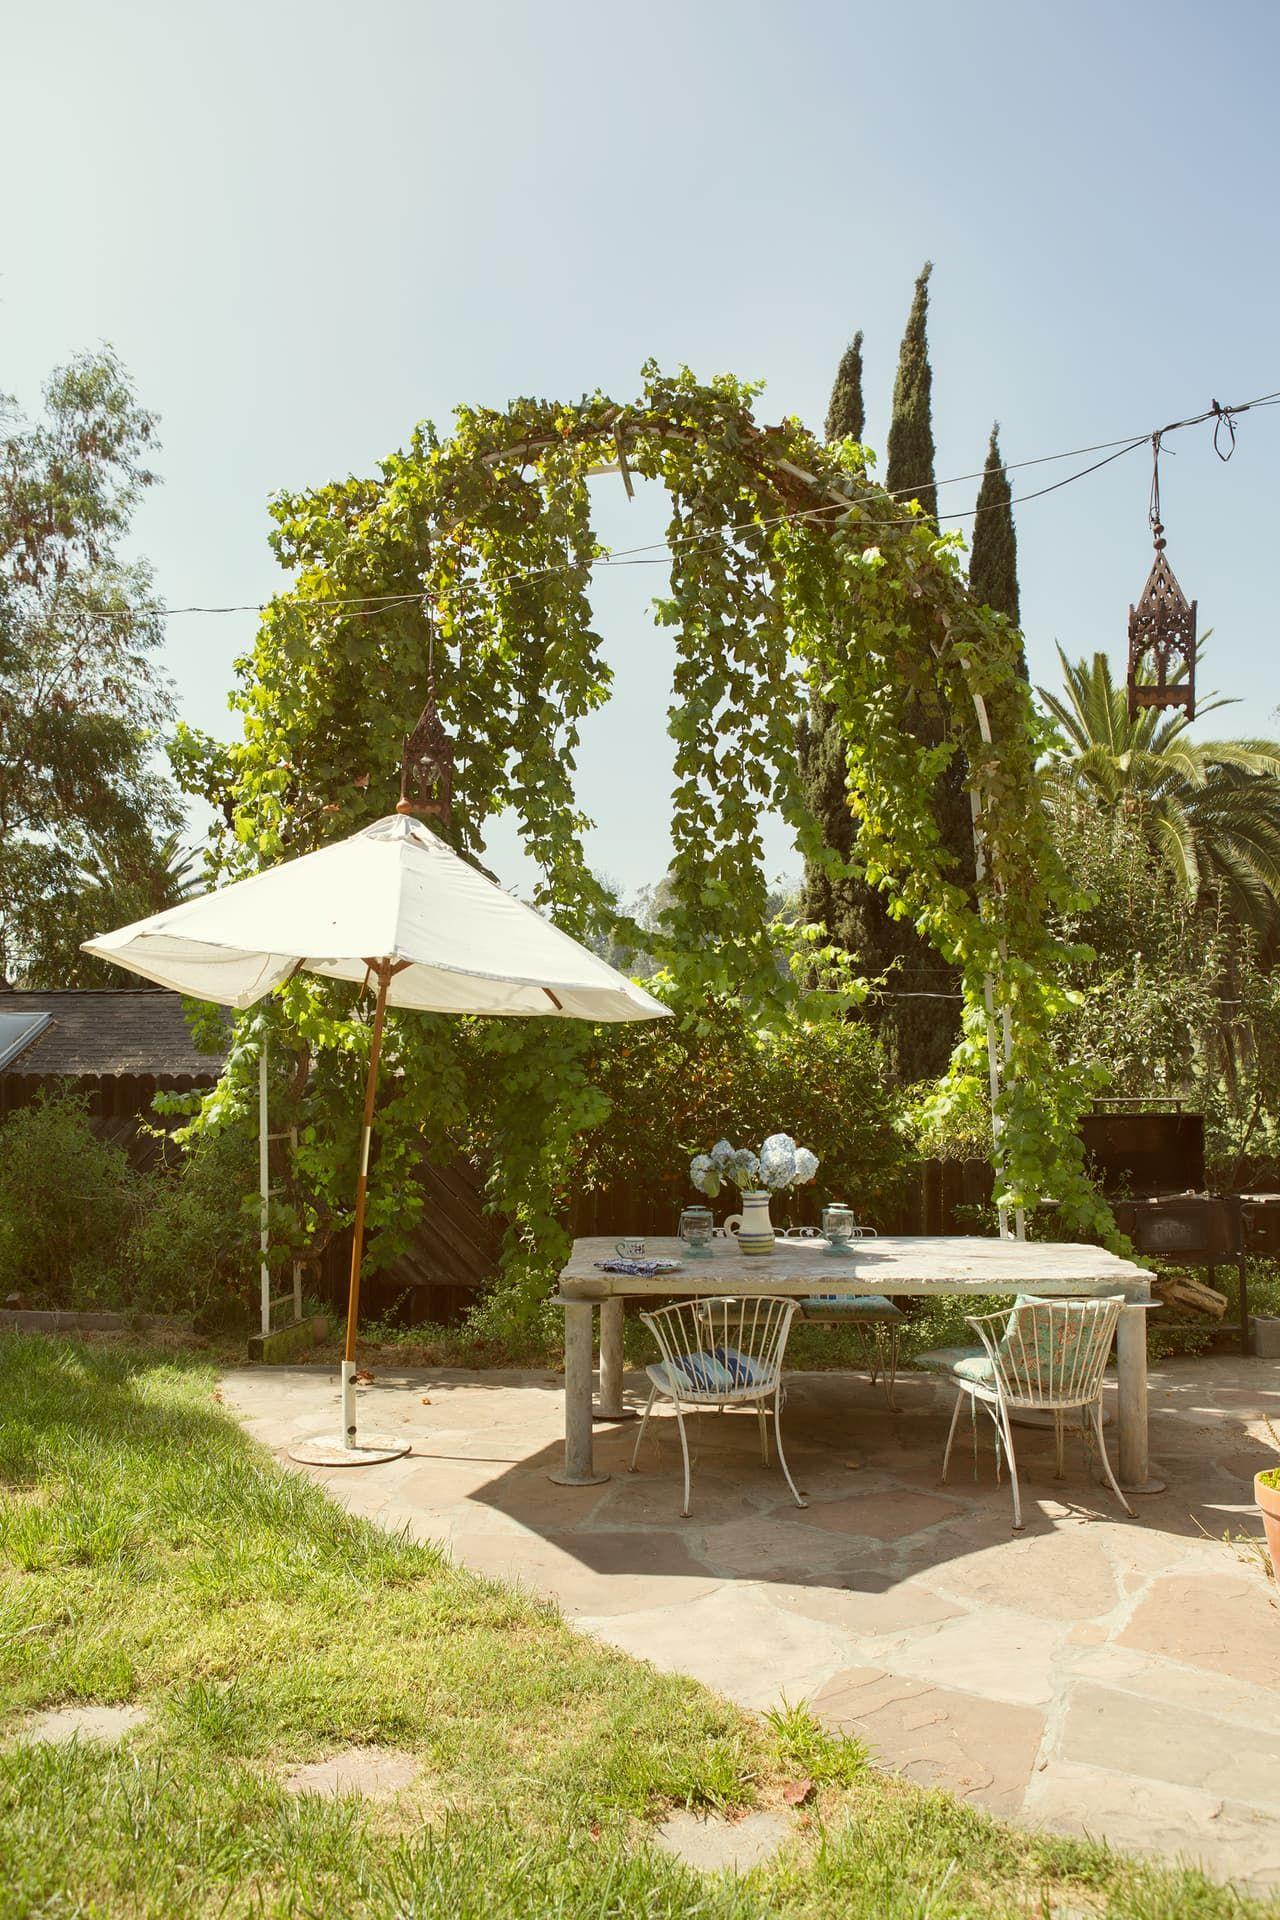 erin u0026 nathan u0027s collaboratively creative bungalow u0026 backyard